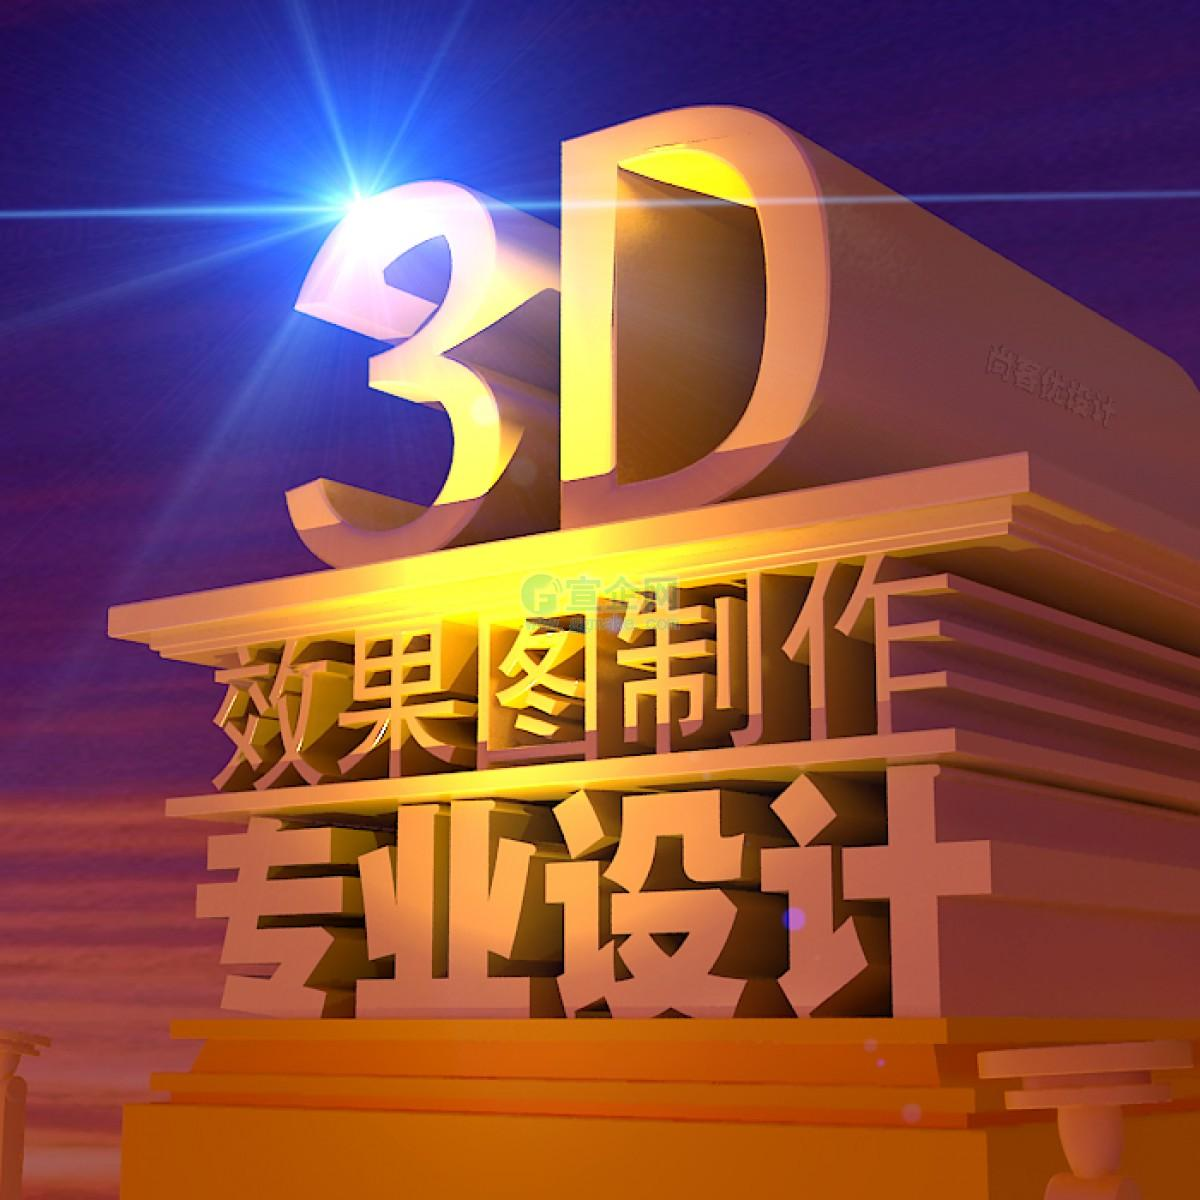 3D效果图制作室内设计建模3dmax渲染工装家装修CAD施工图代画代做